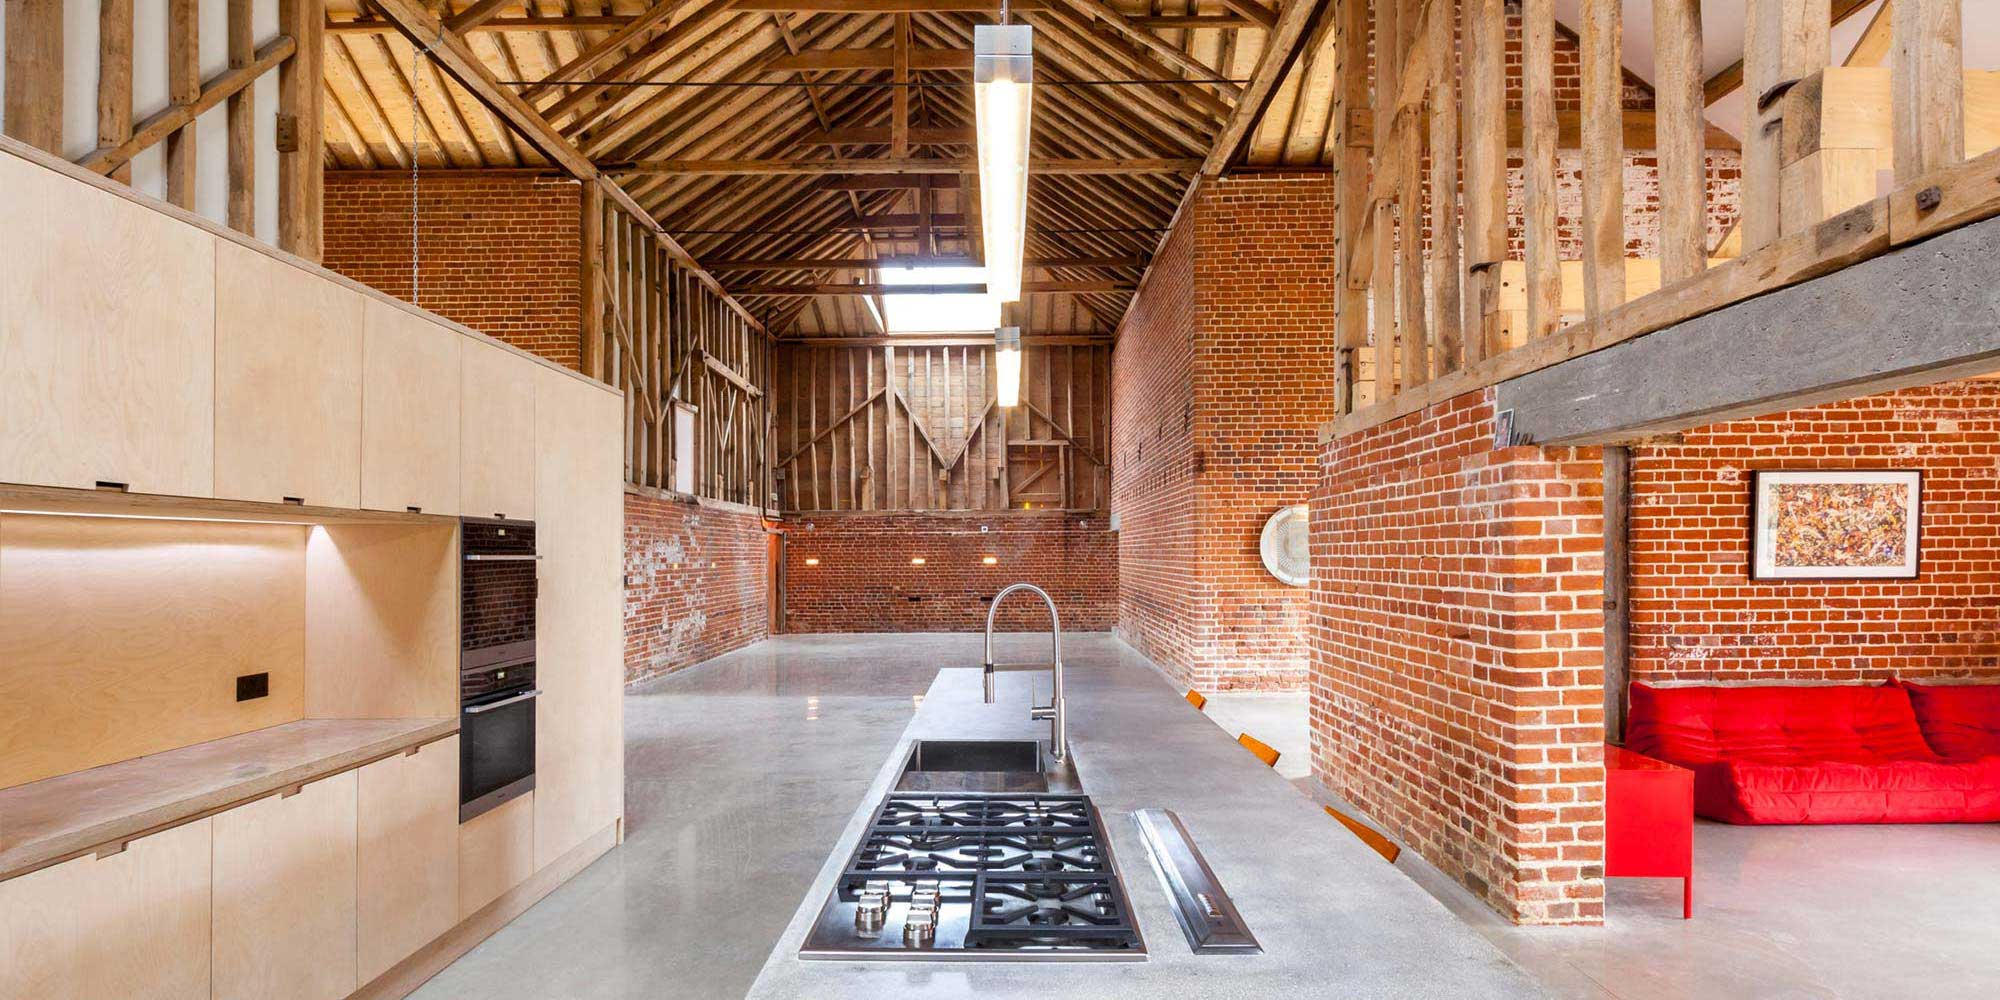 loft dans une grange par david nossiter architects. Black Bedroom Furniture Sets. Home Design Ideas